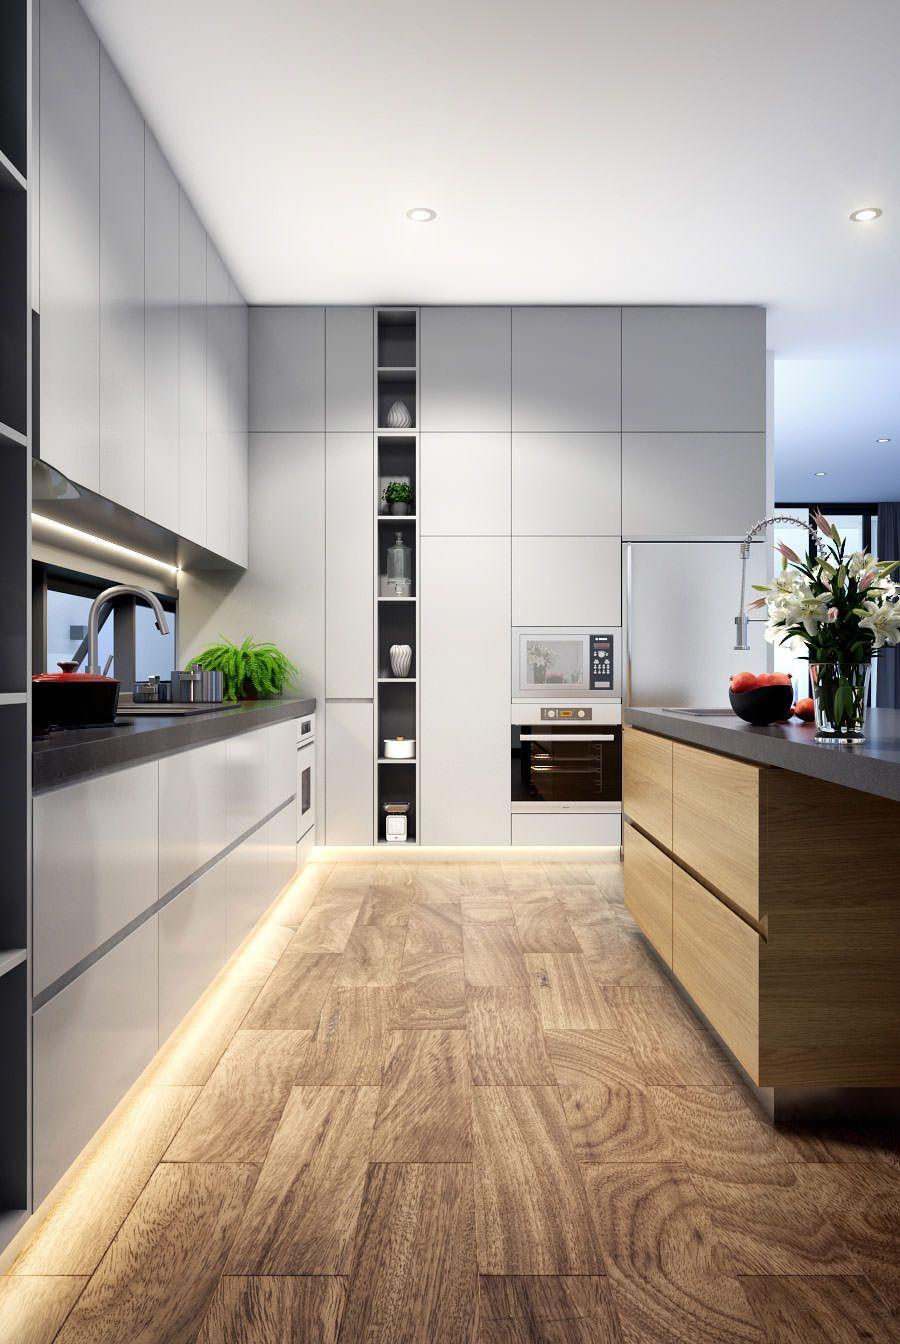 100 idee di cucine moderne con elementi in legno | interiér ...